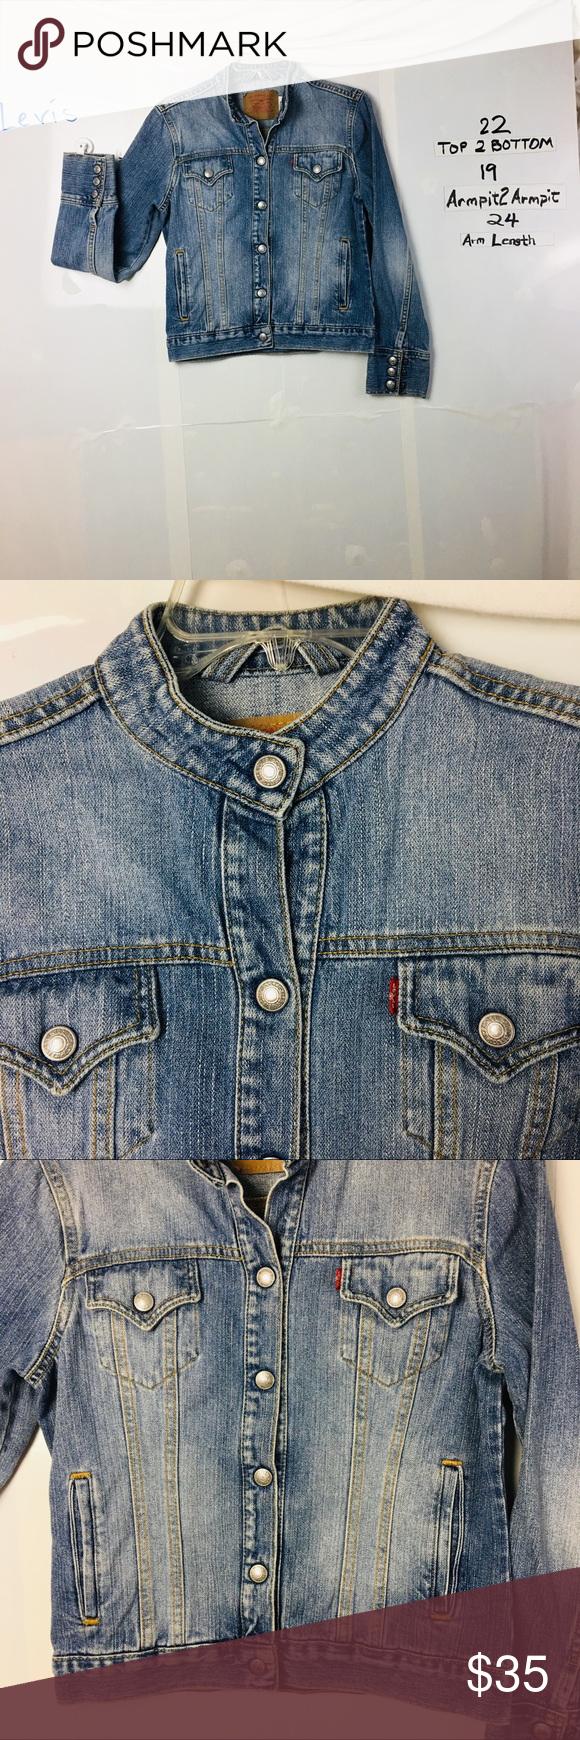 Levi S Collarless Denim Jacket Small Collarless Denim Jacket Collarless Denim Jacket [ 1740 x 580 Pixel ]